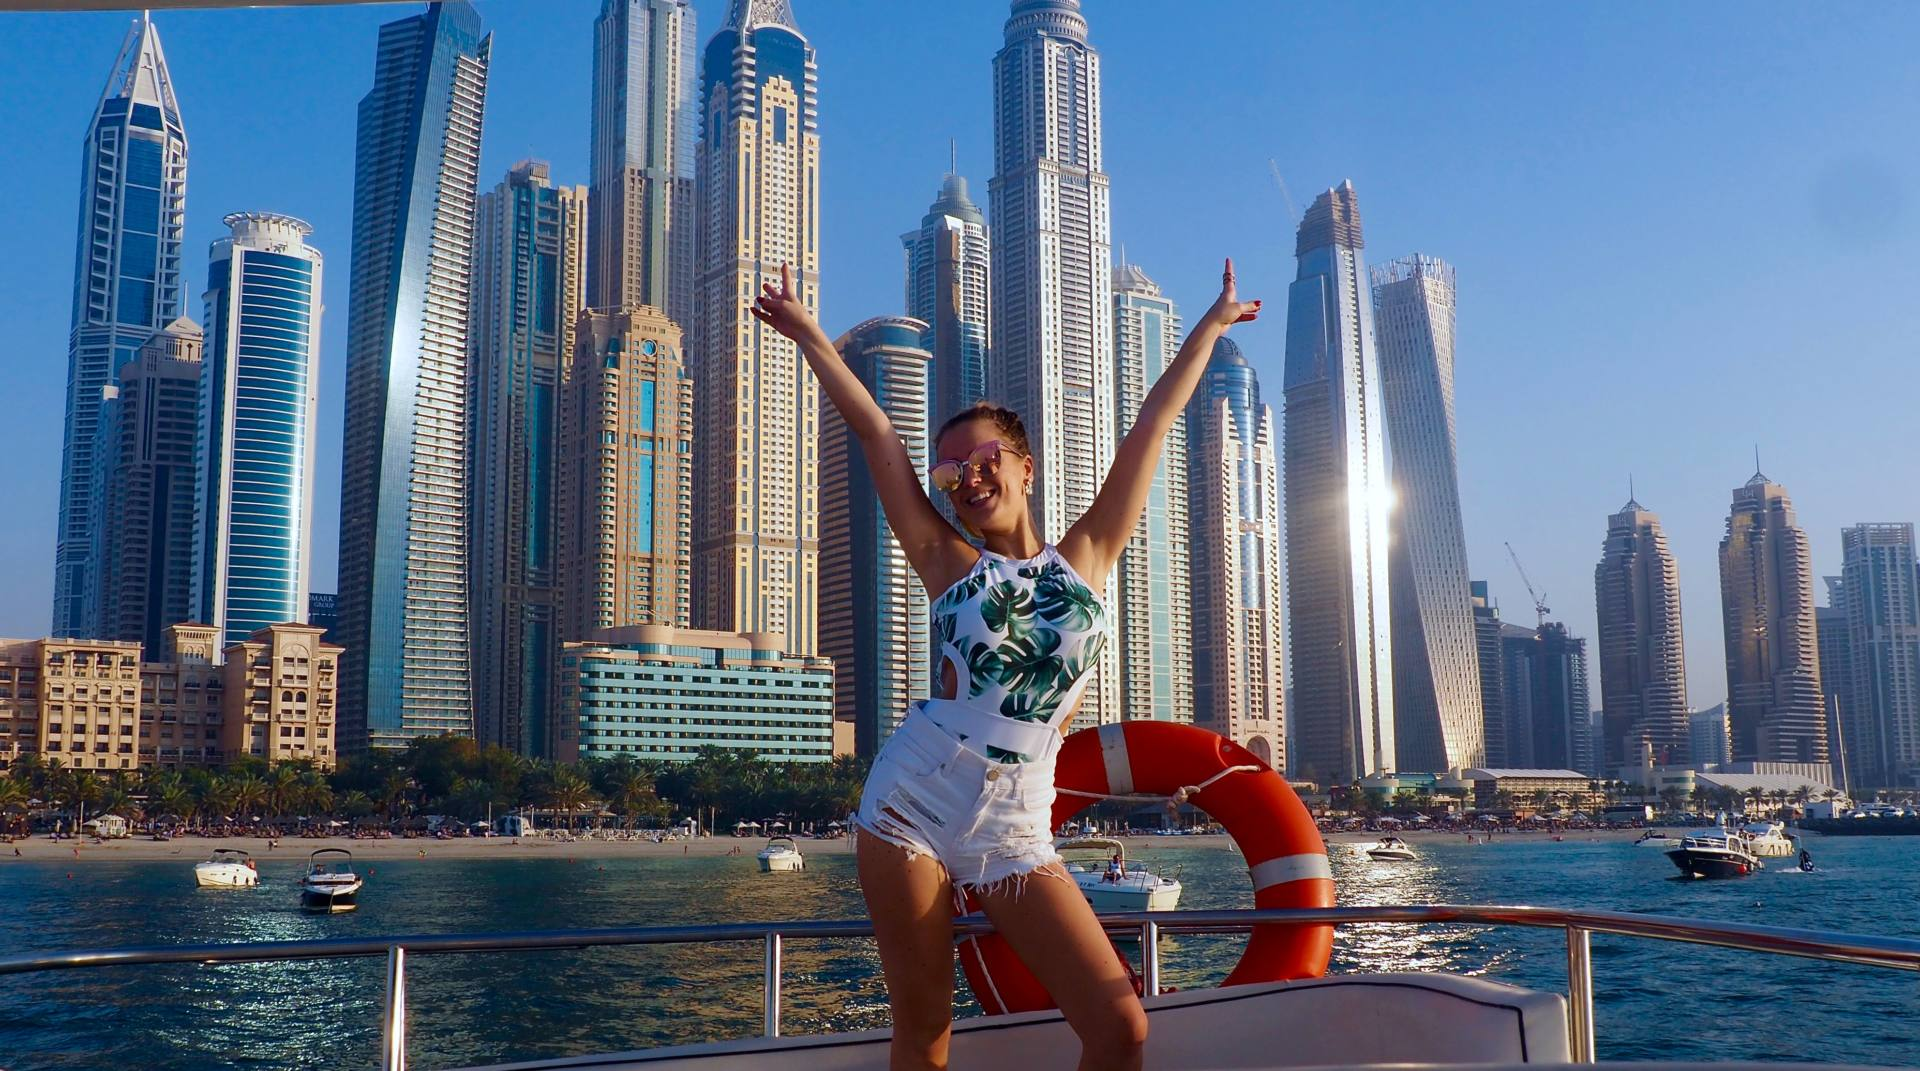 Is It a Bad Idea to Visit Dubai in Summer? – Desert Safari Dubai